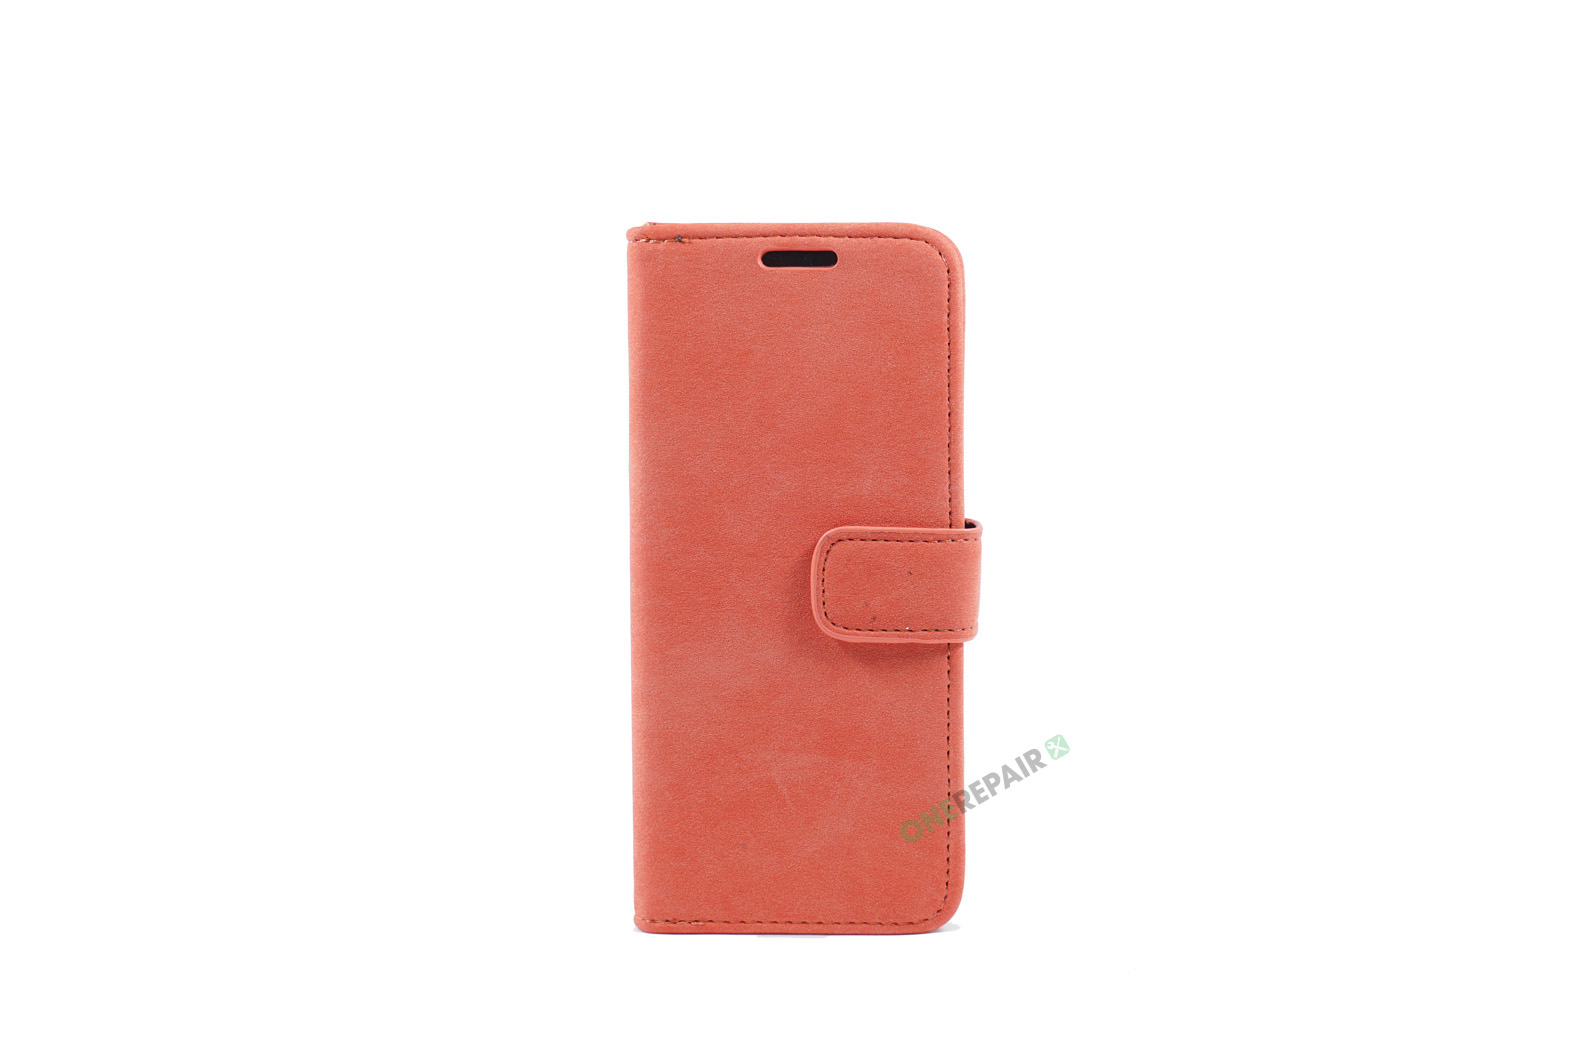 350725_Samsung_S8_Flipcover_Rustik_Cover_Roed_Pastel_OneRepair_WM_00001